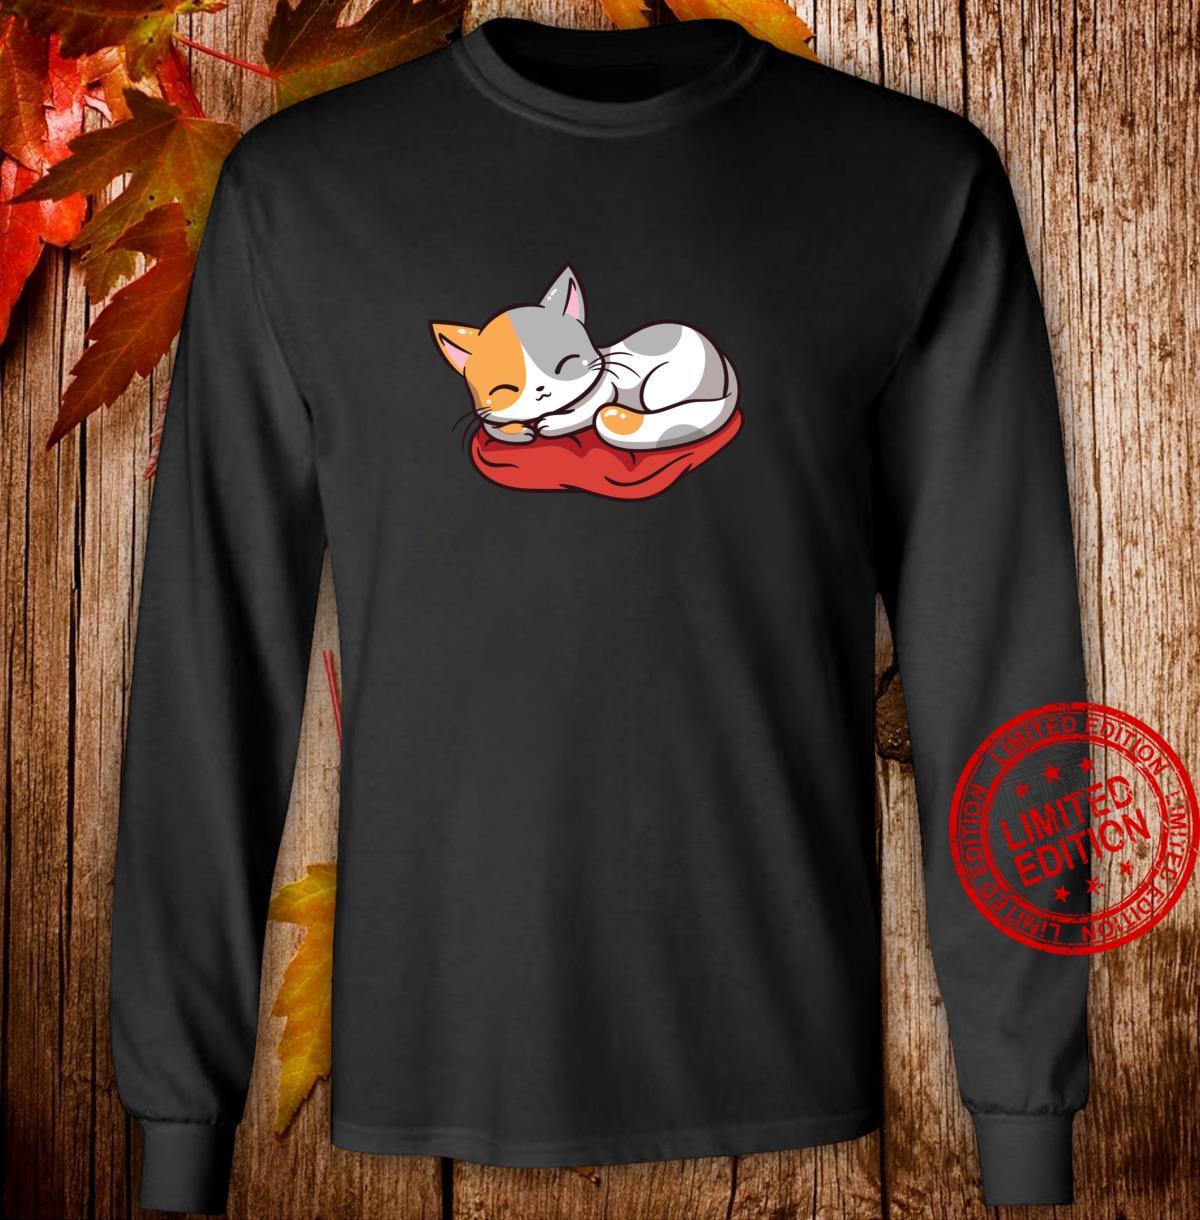 Kawaii süße japanische Anime Katze Neko Girl Langarmshirt Shirt long sleeved